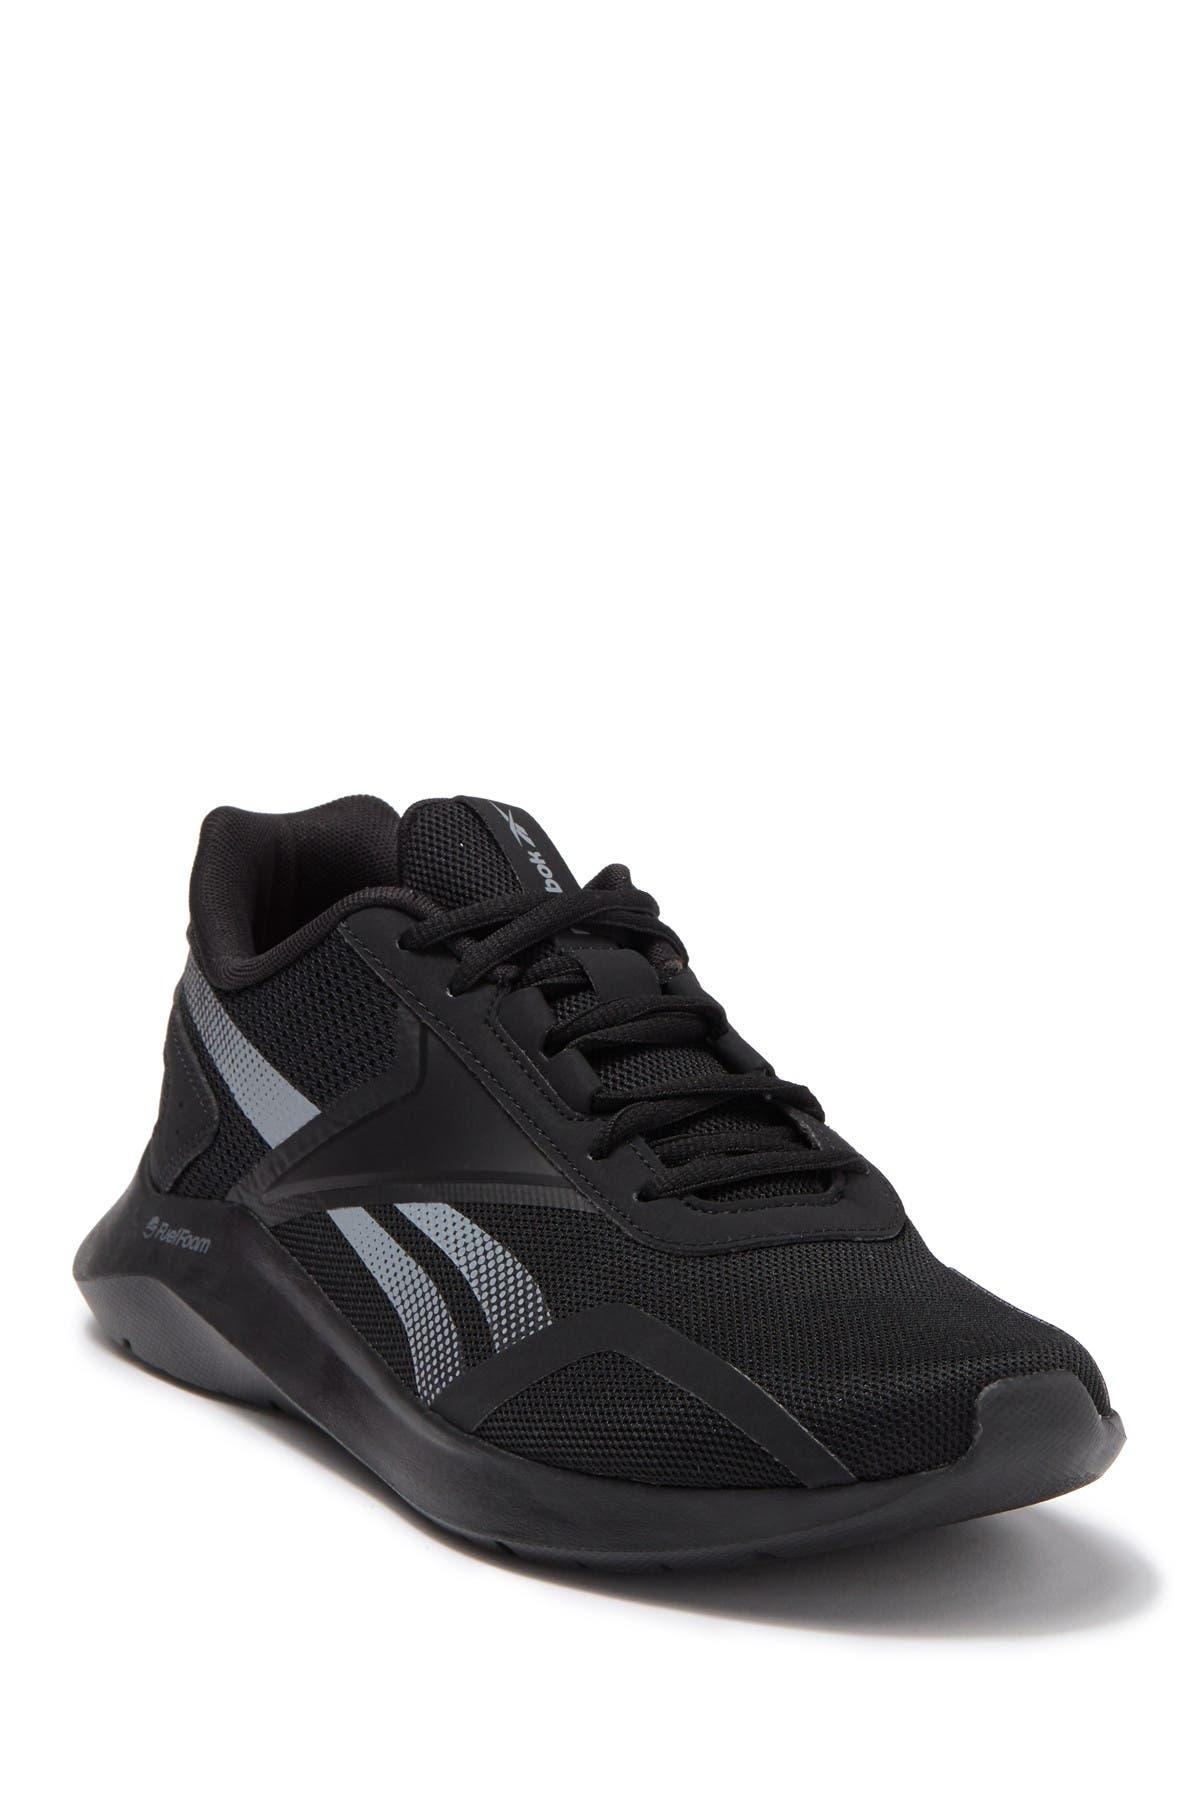 Image of Reebok Energylux 2 Running Shoe